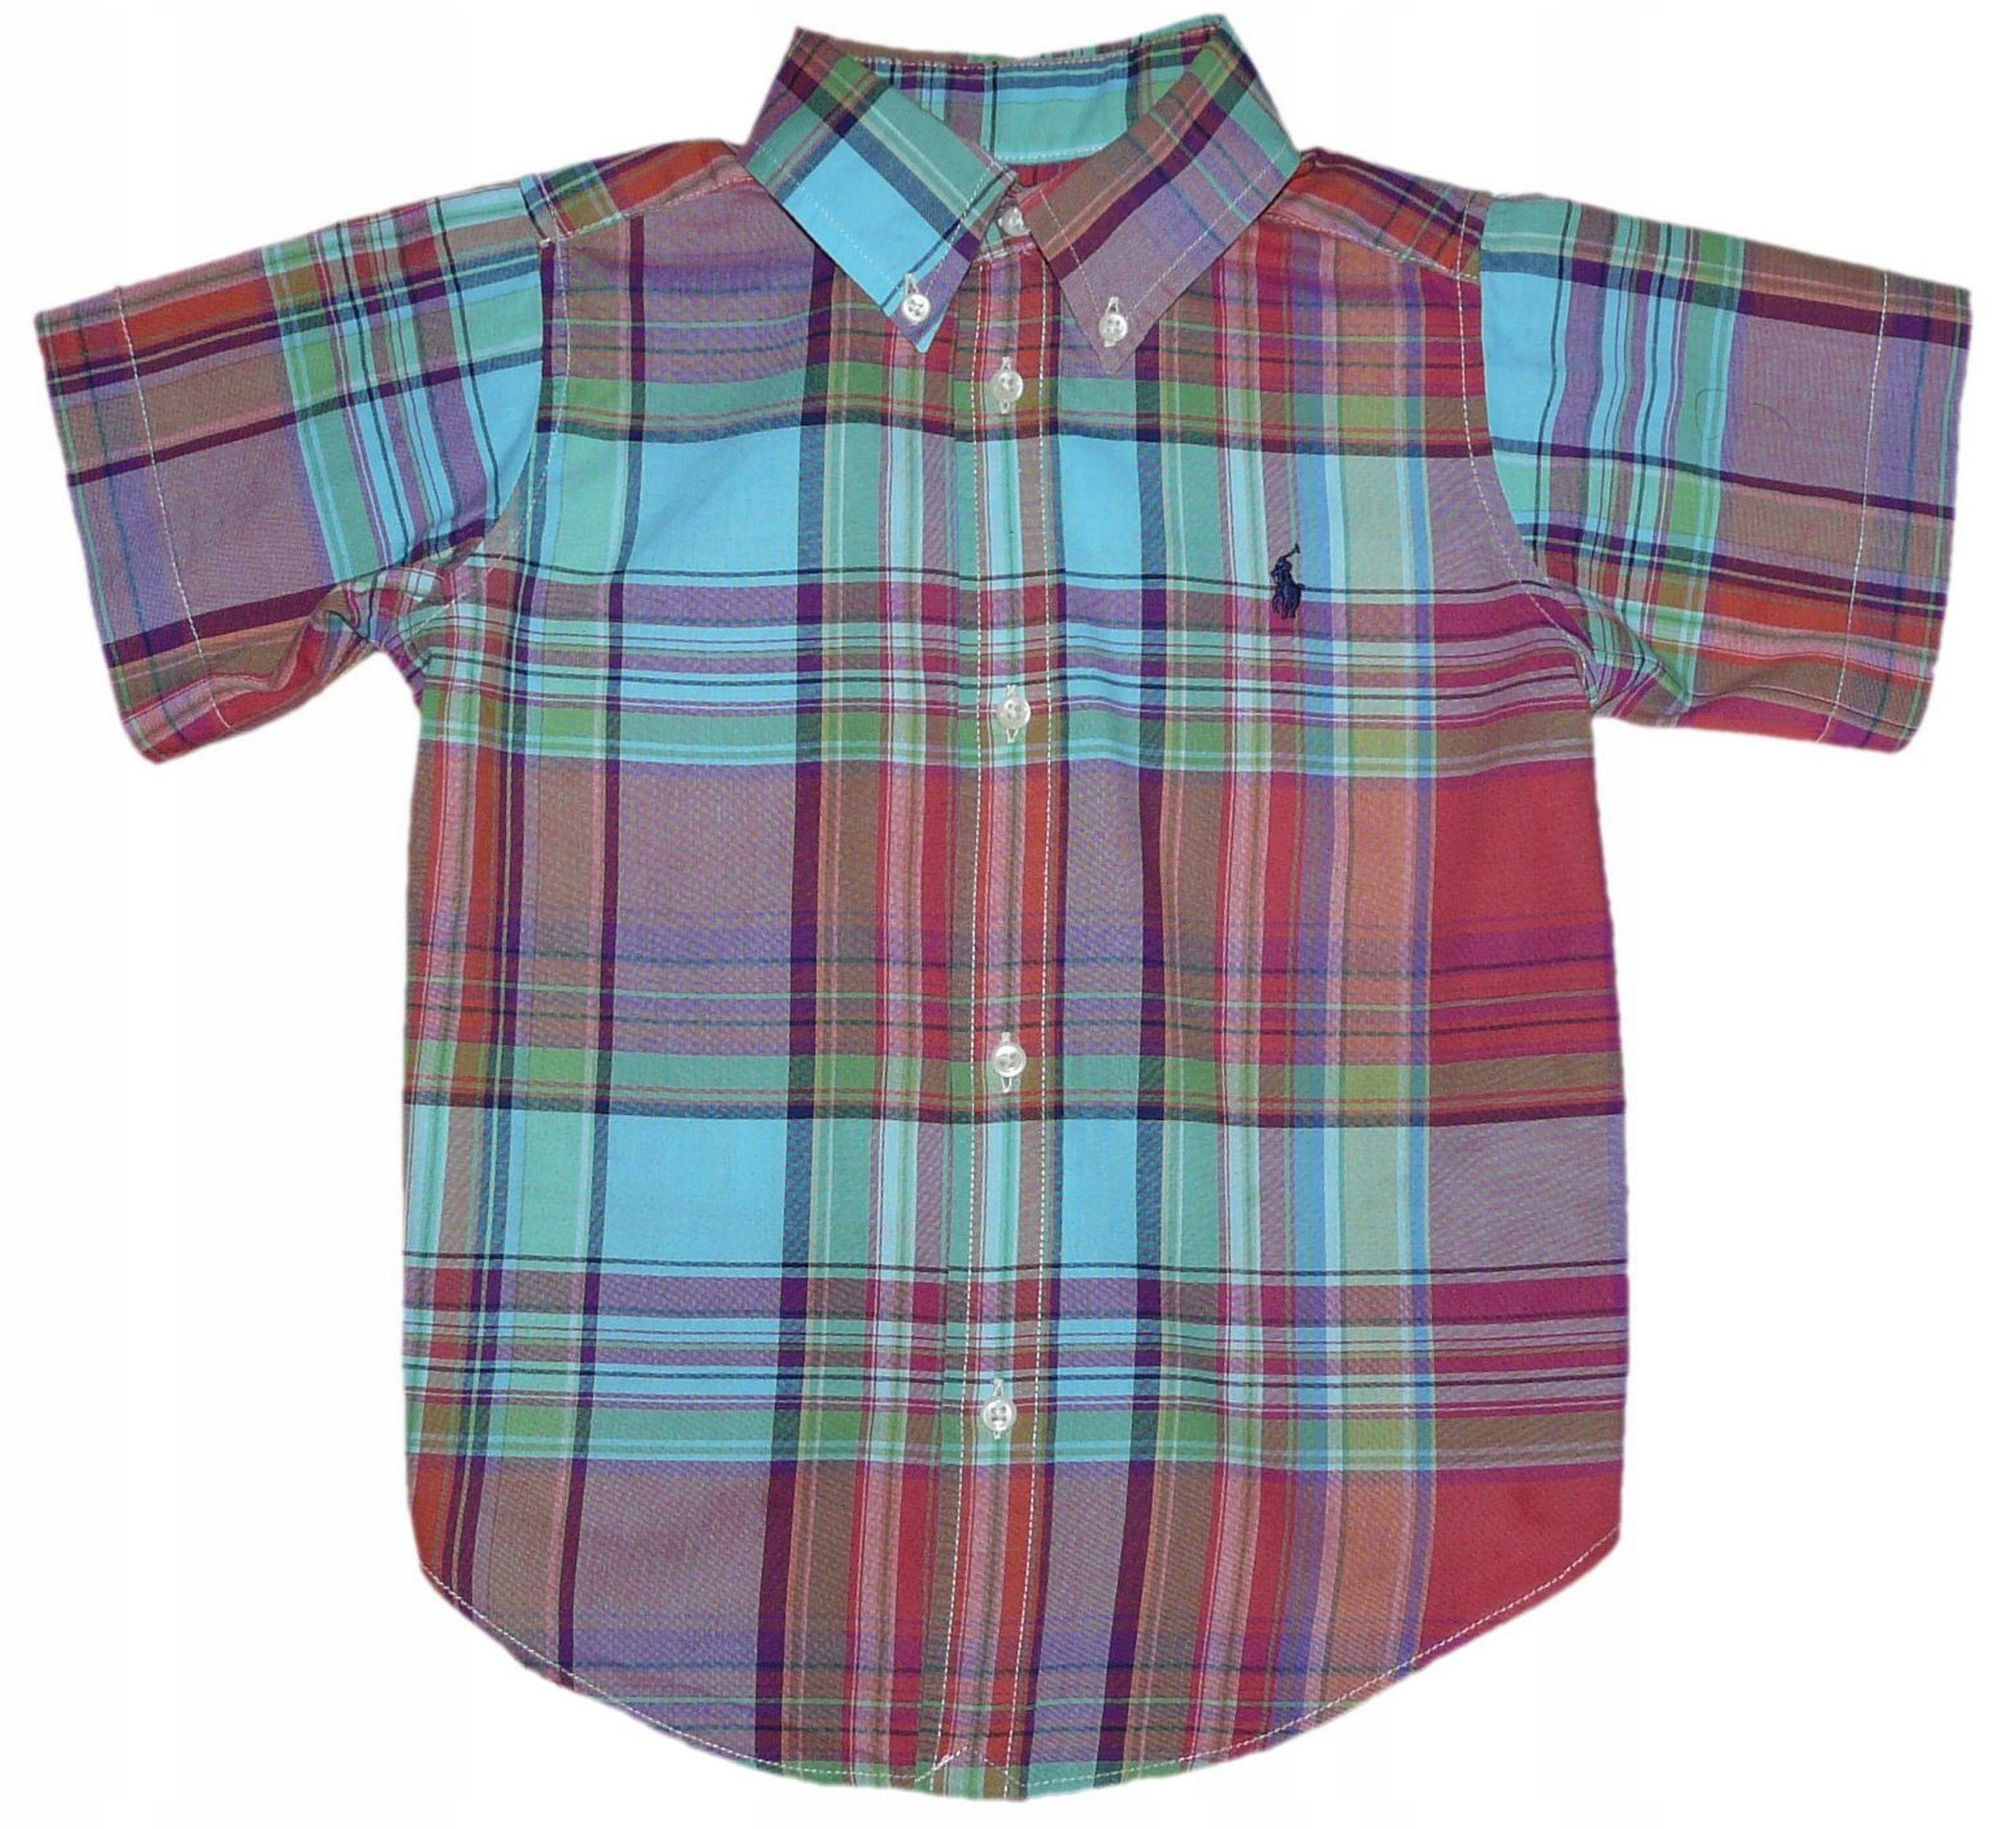 3c16ef2ab RALPH LAUREN koszula dla chłopca krata 3 L j.nowa - 7534996570 ...